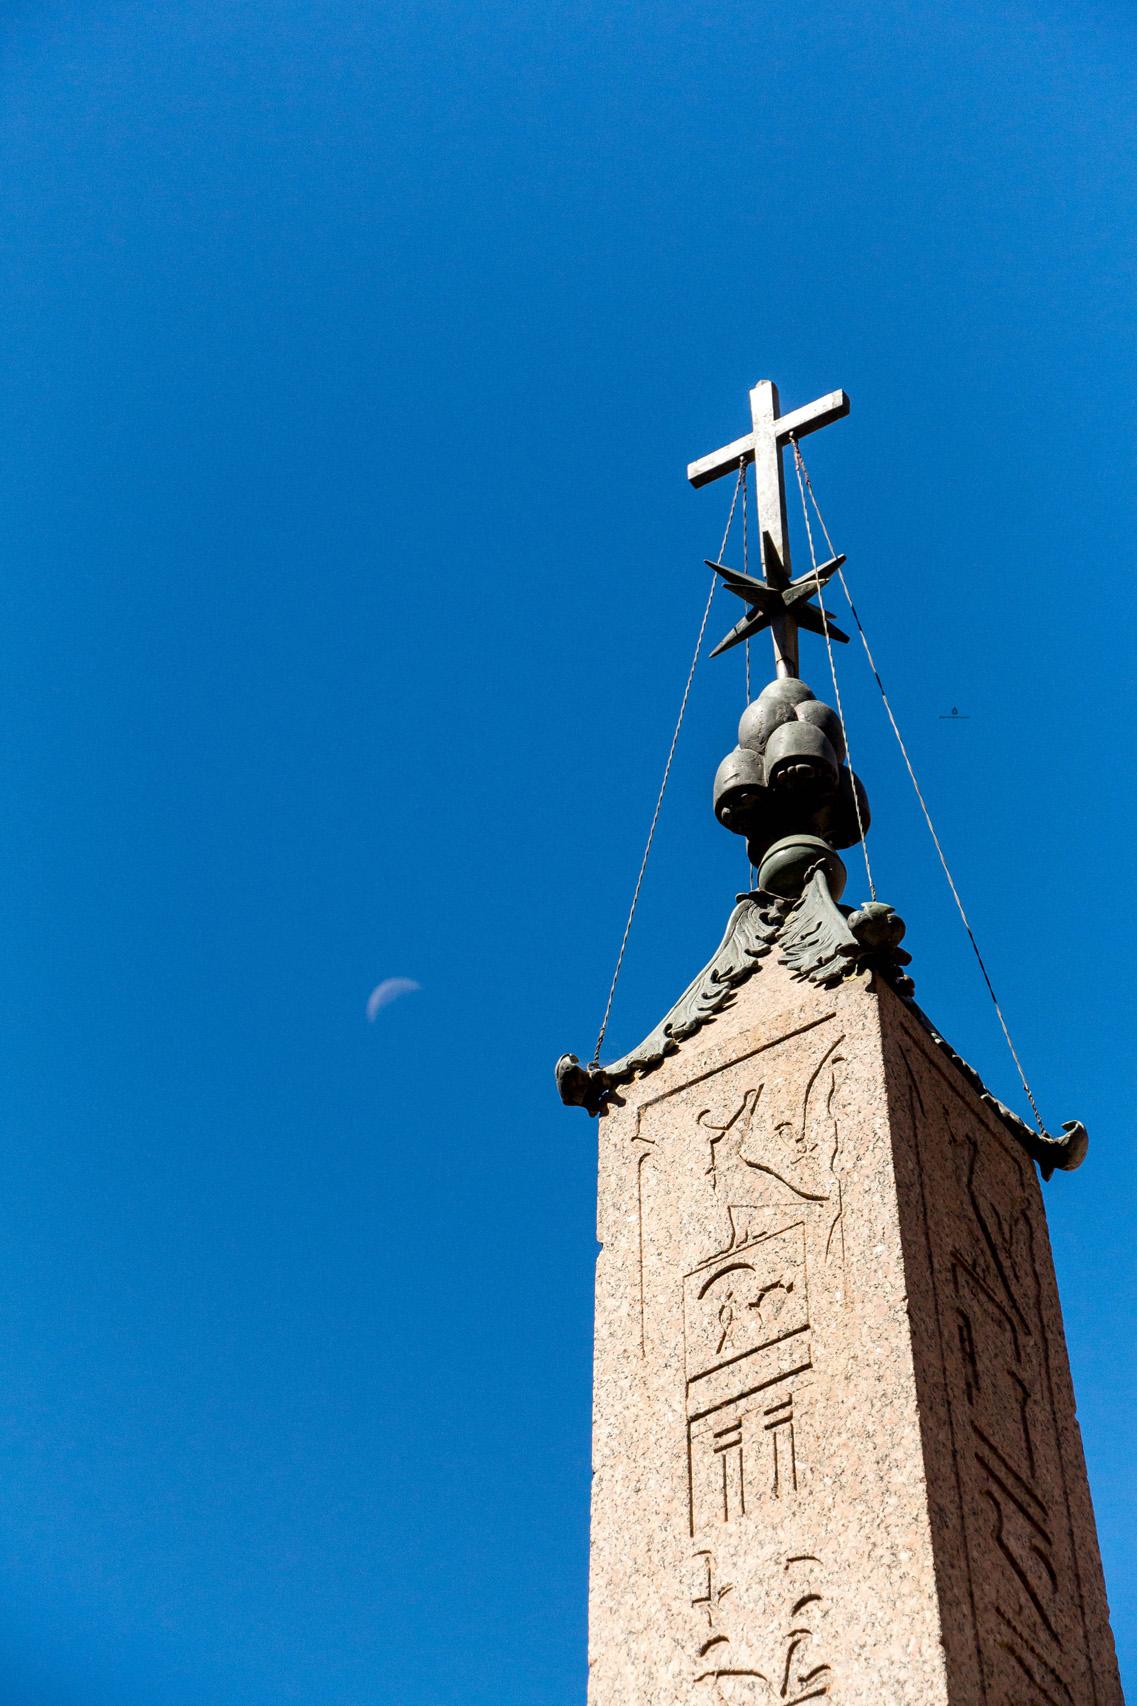 Elephant and Obelisk, Rome